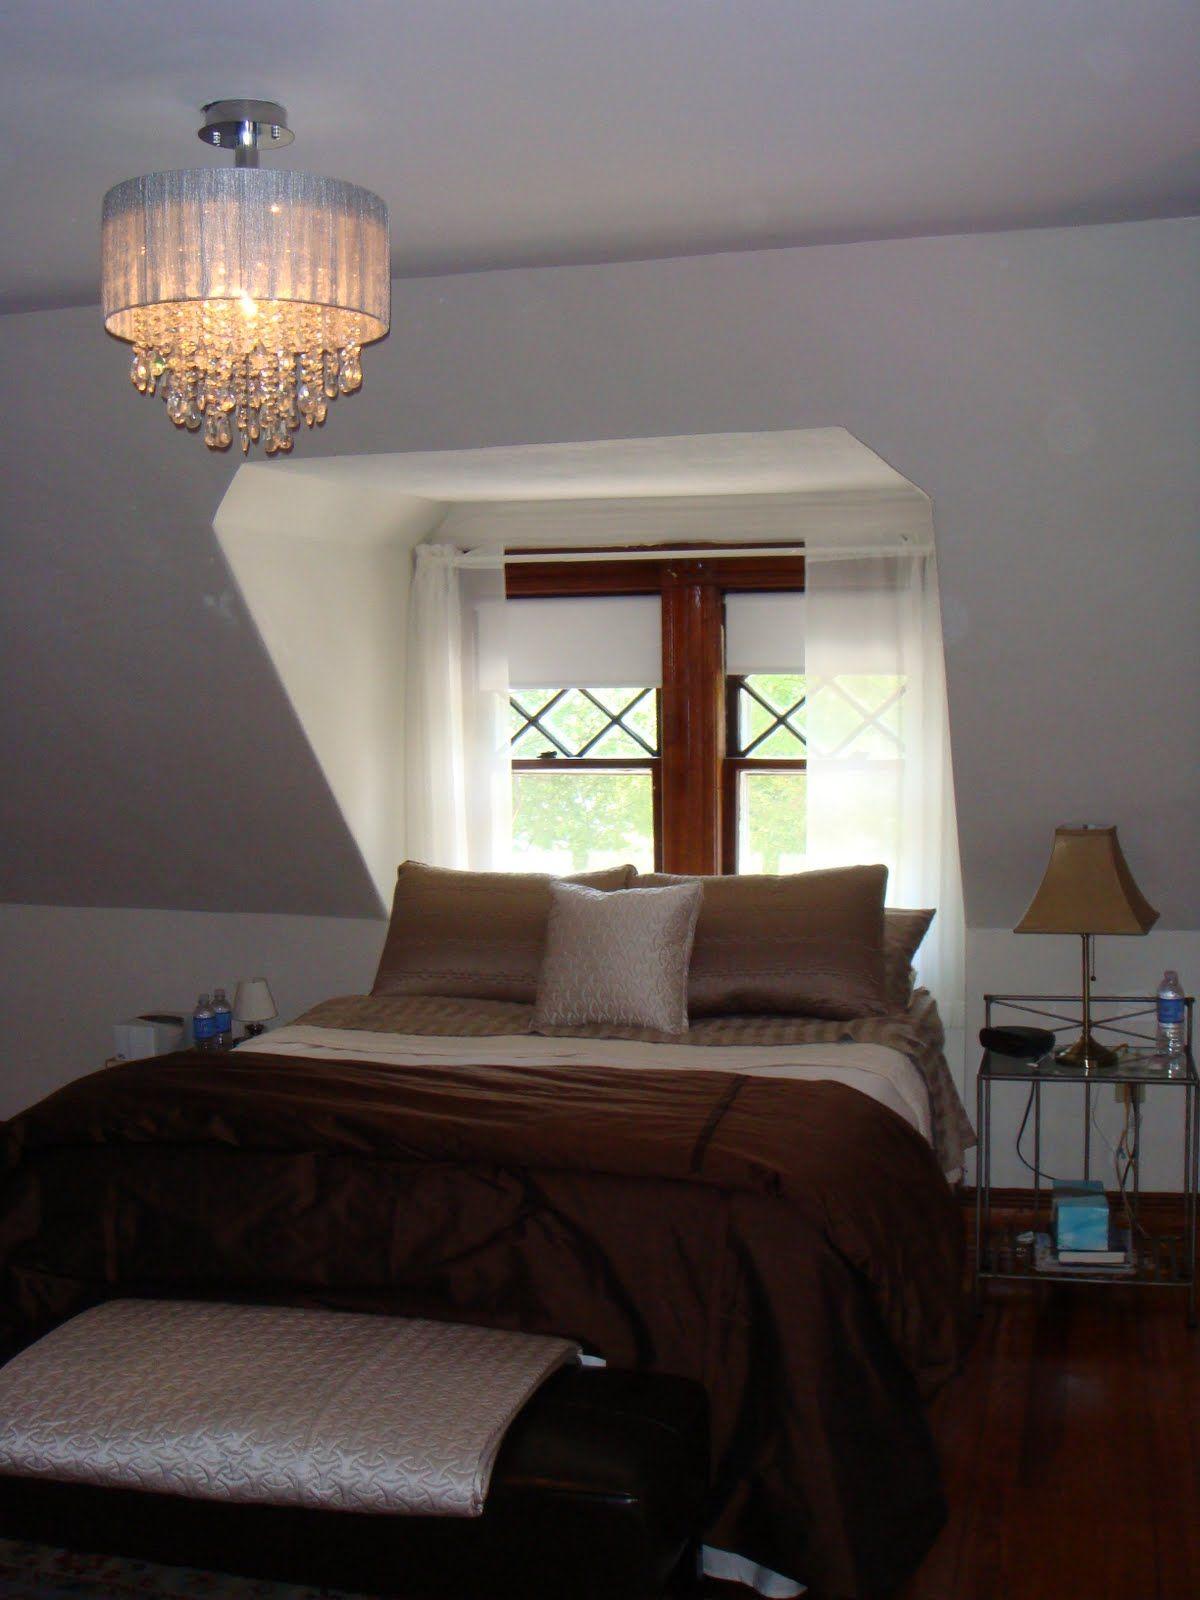 bedroom light fixtures. Brilliant Bedroom Light Fixtures Decoration Ideas With   Www.bocadolobo.com R